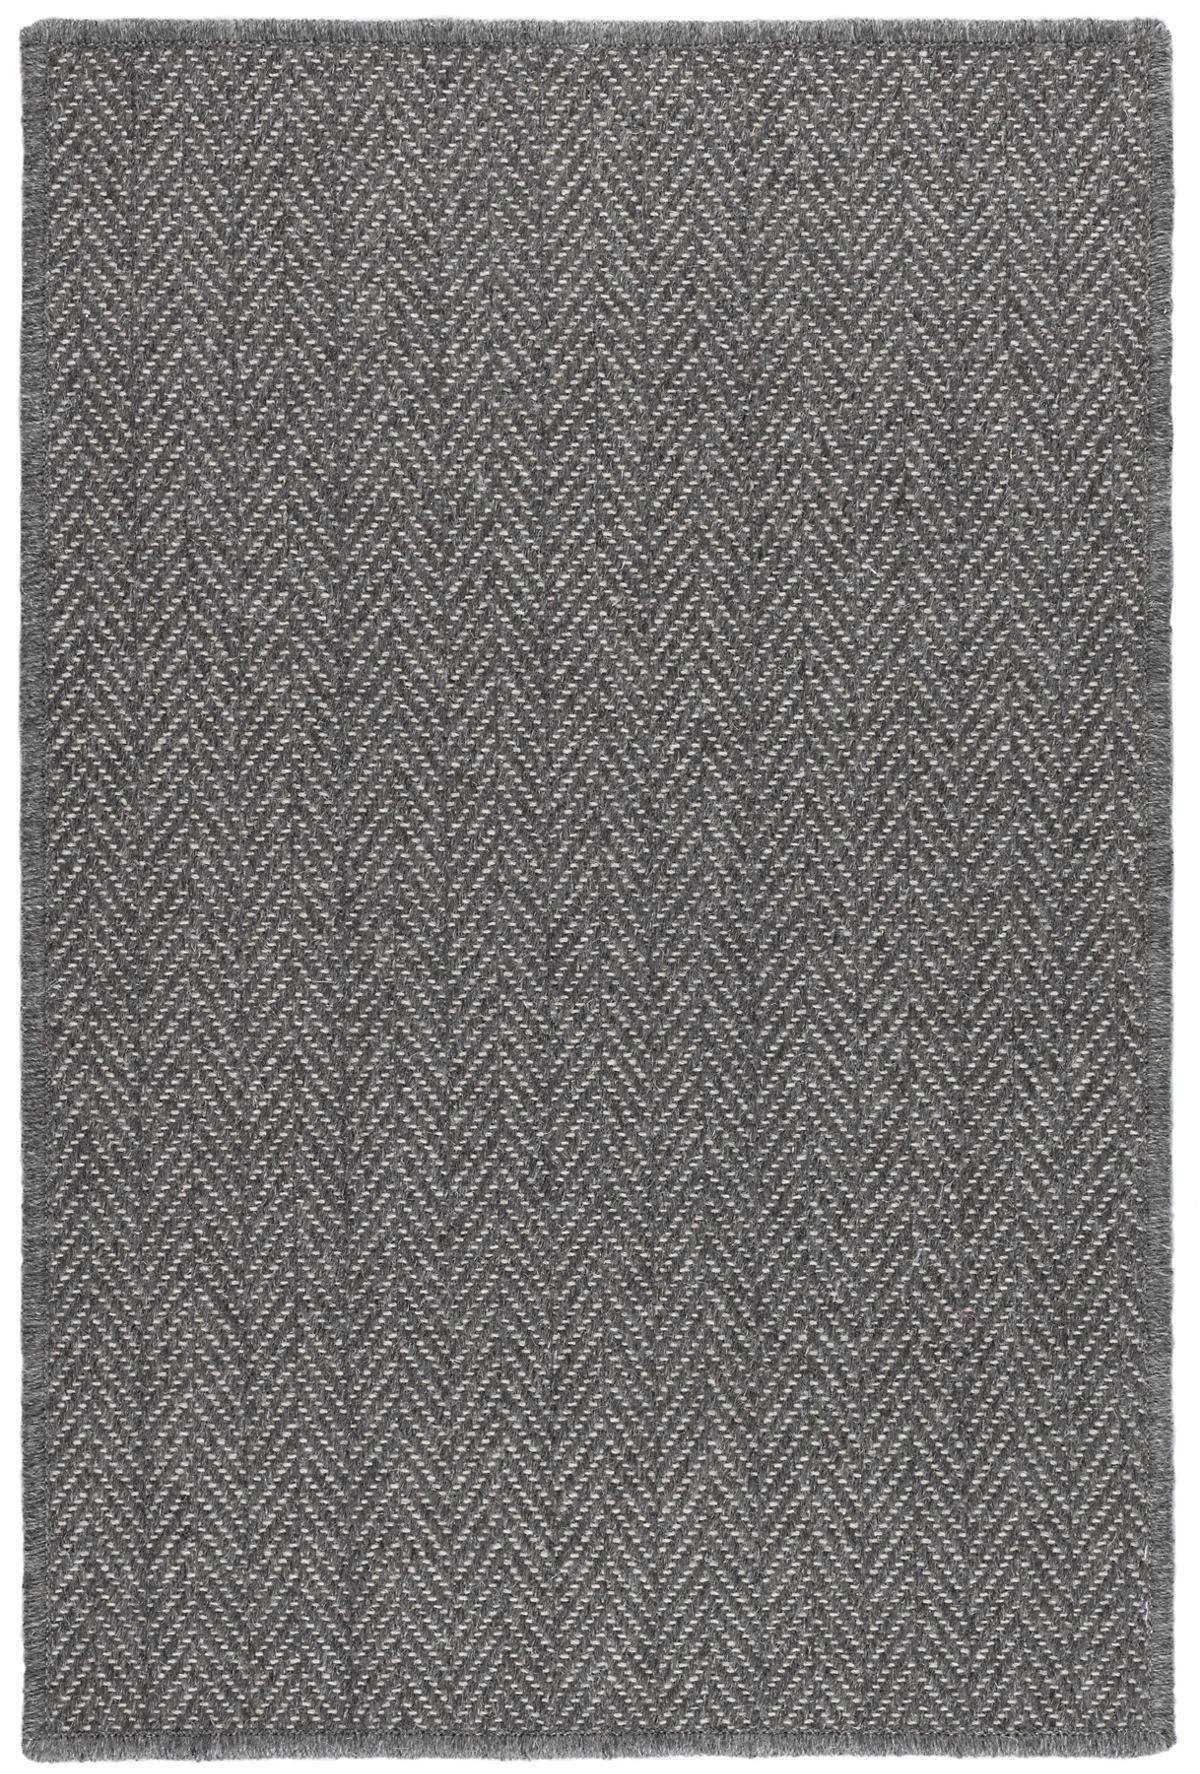 Piper Shale Woven Wool Custom Rug